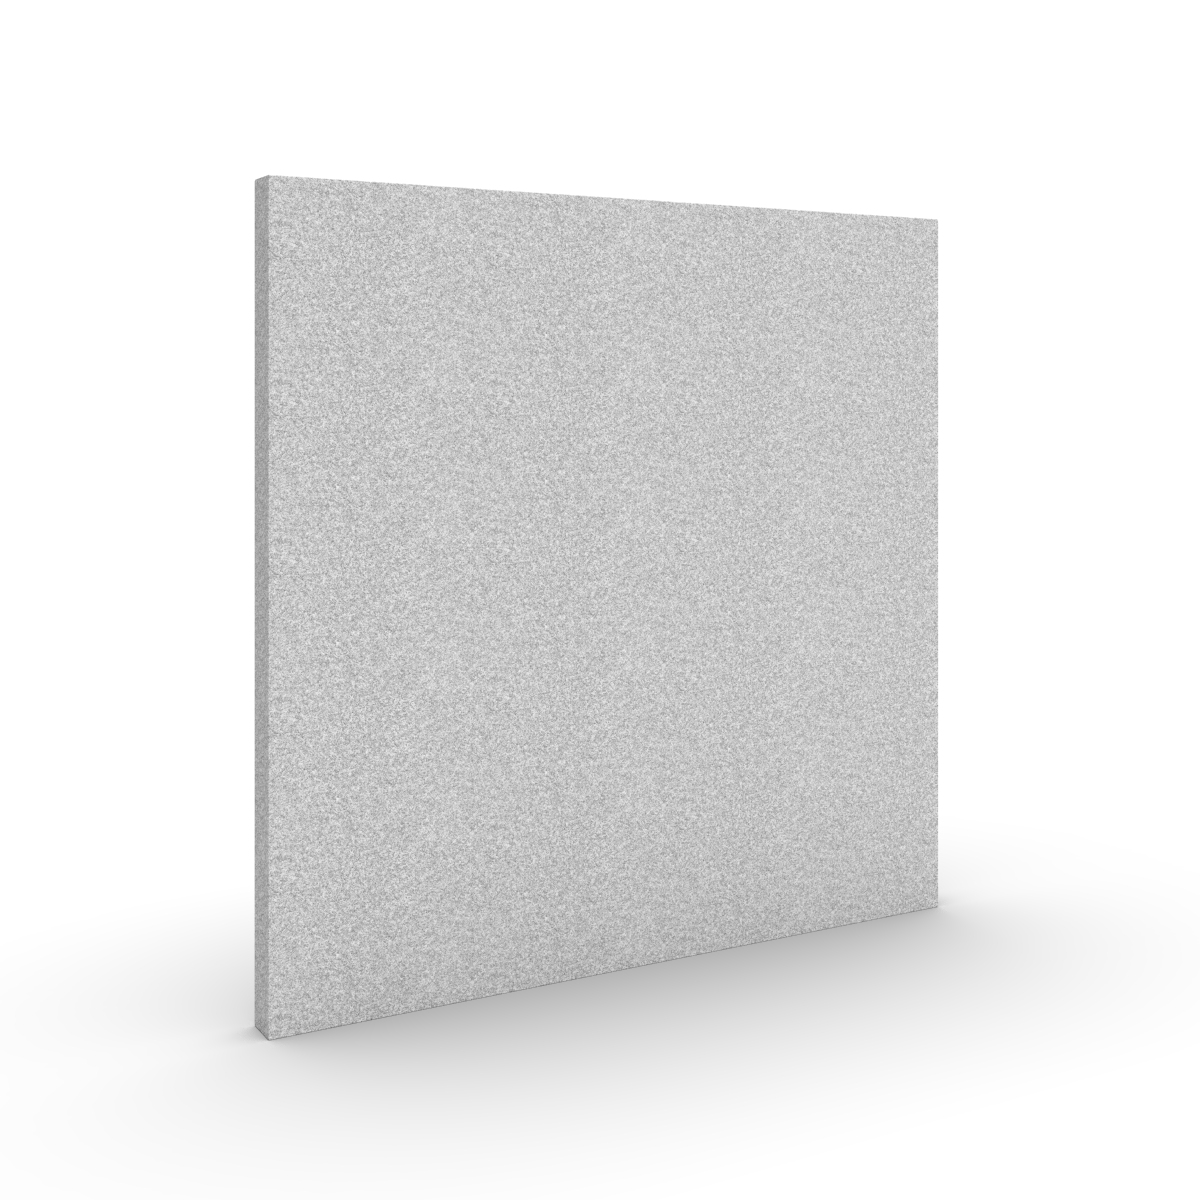 Basic Wall 116x116